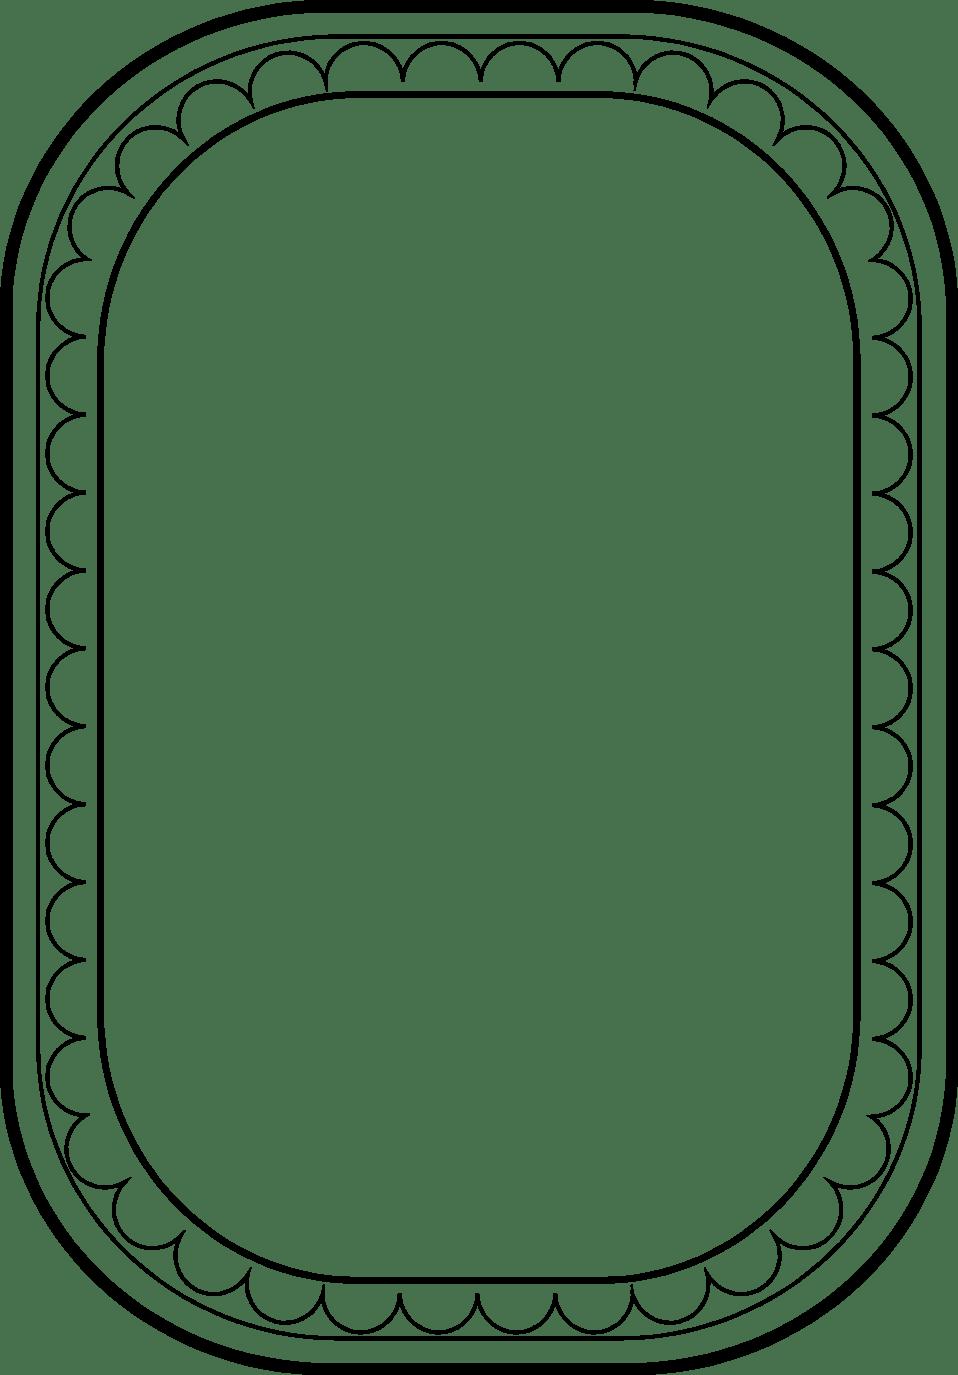 Clipart frames simple, Clipart frames simple Transparent